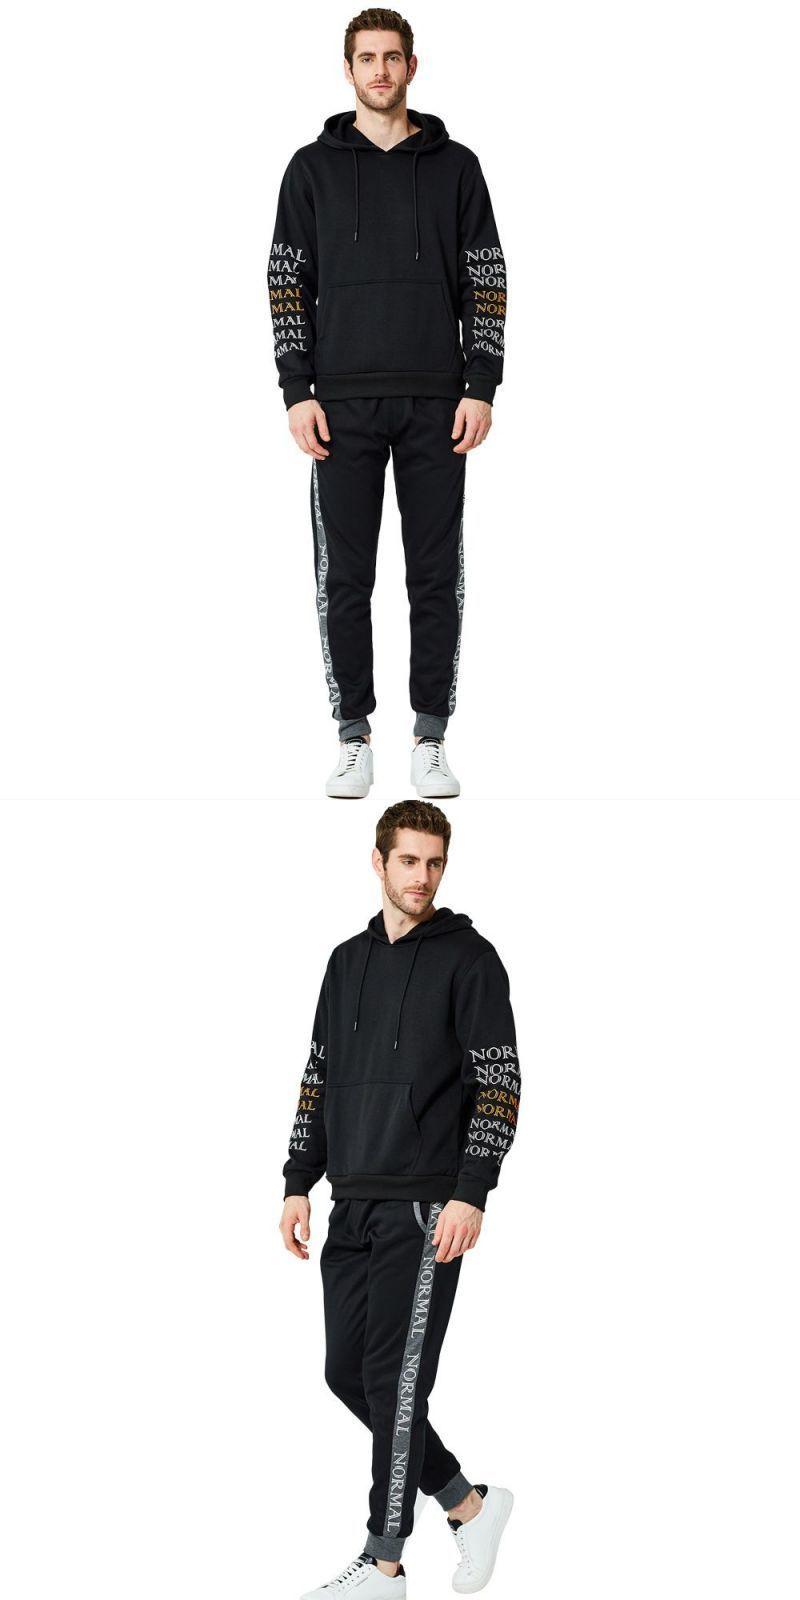 2PCS Men Hoodie Suit Autumn Winter Hoodie Pants Set Cozy Tracksuit Sportswear UK